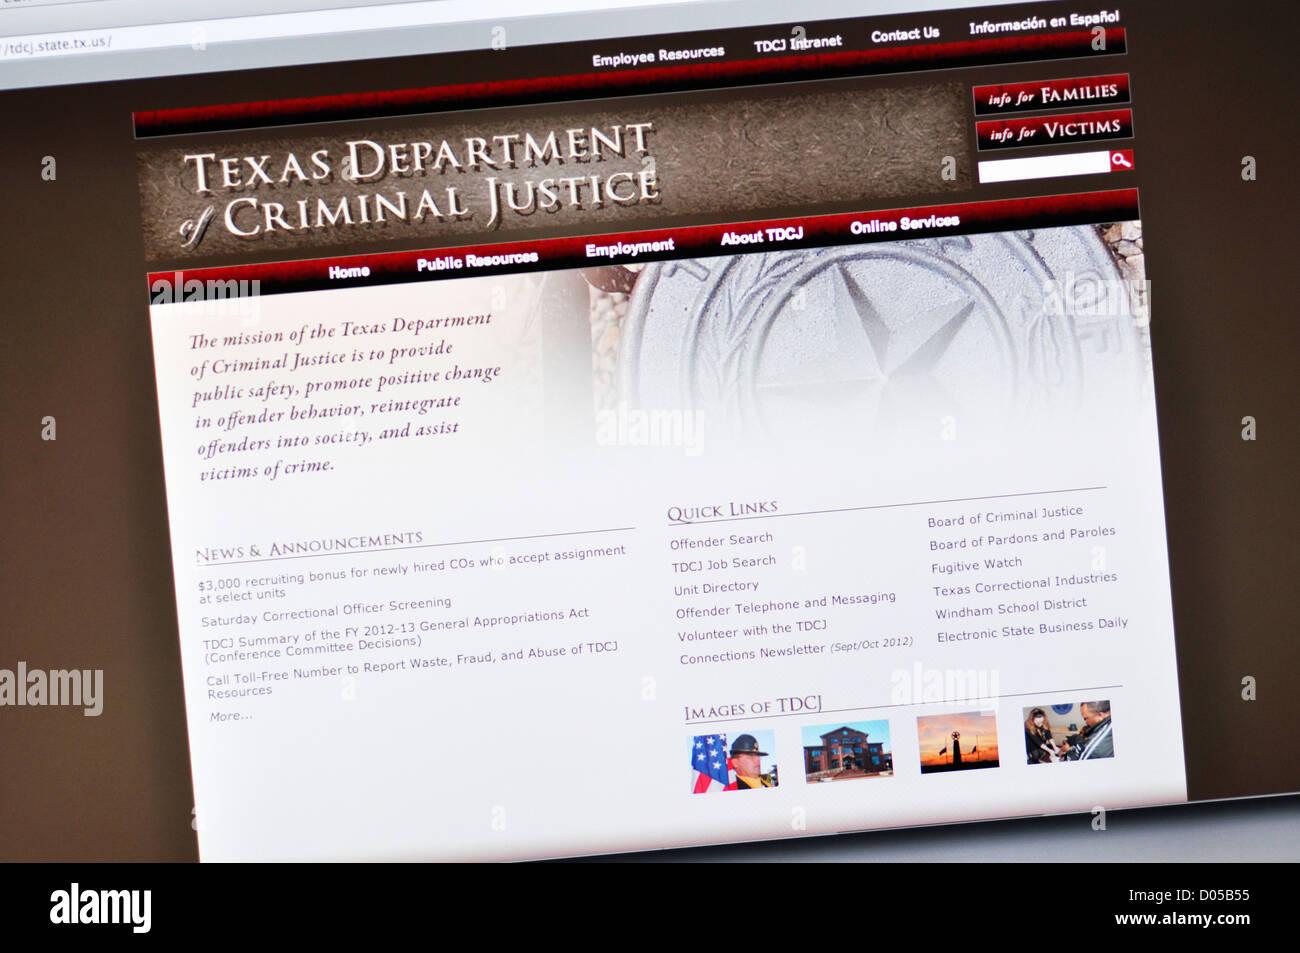 Texas Department of Criminal Justice website Stock Photo